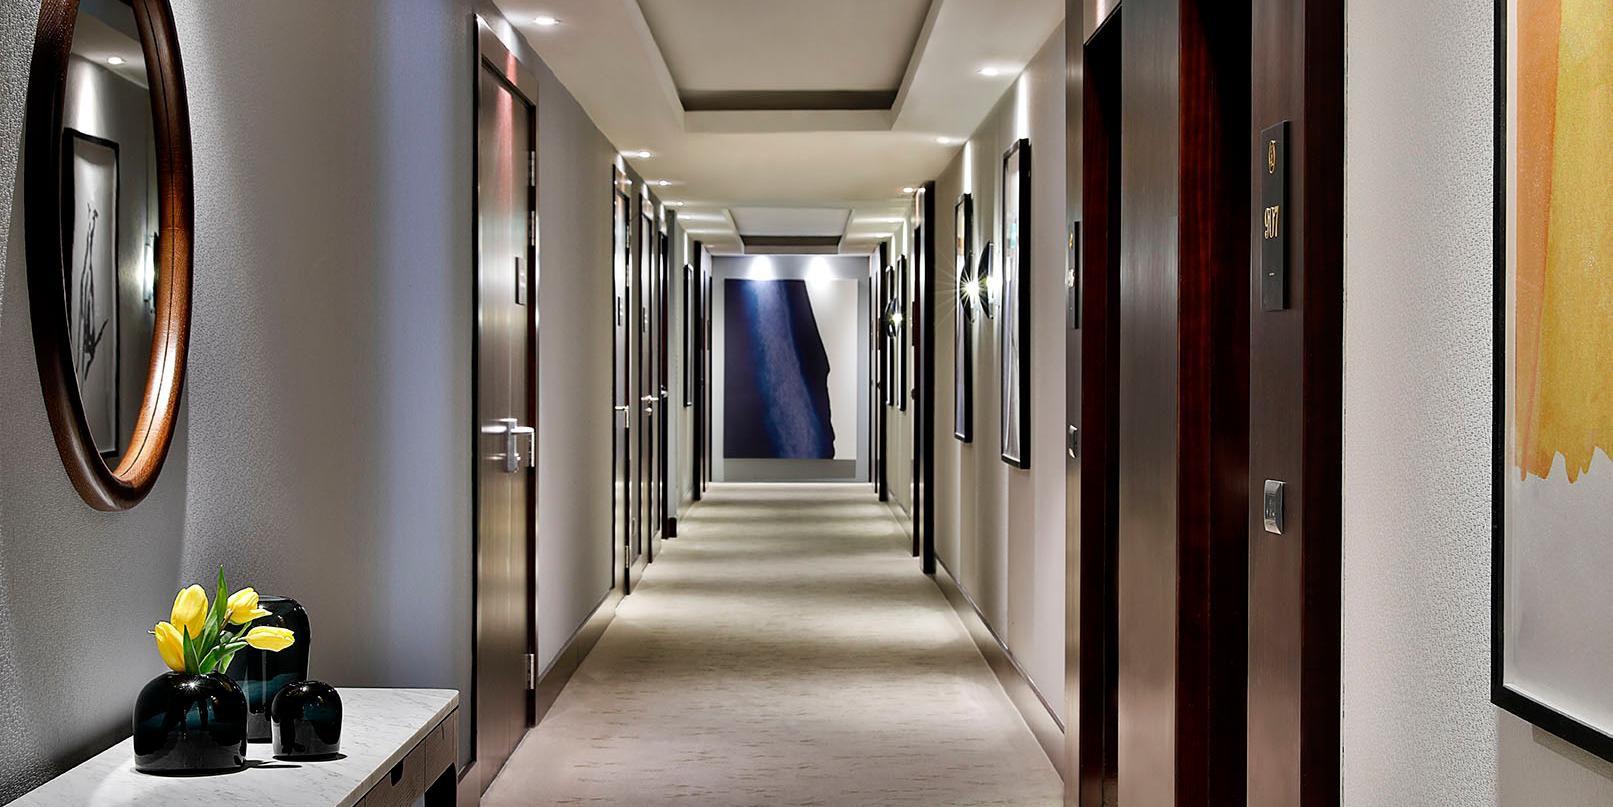 Room floors hallway, voco Dubai, Sheikh Zayed Road